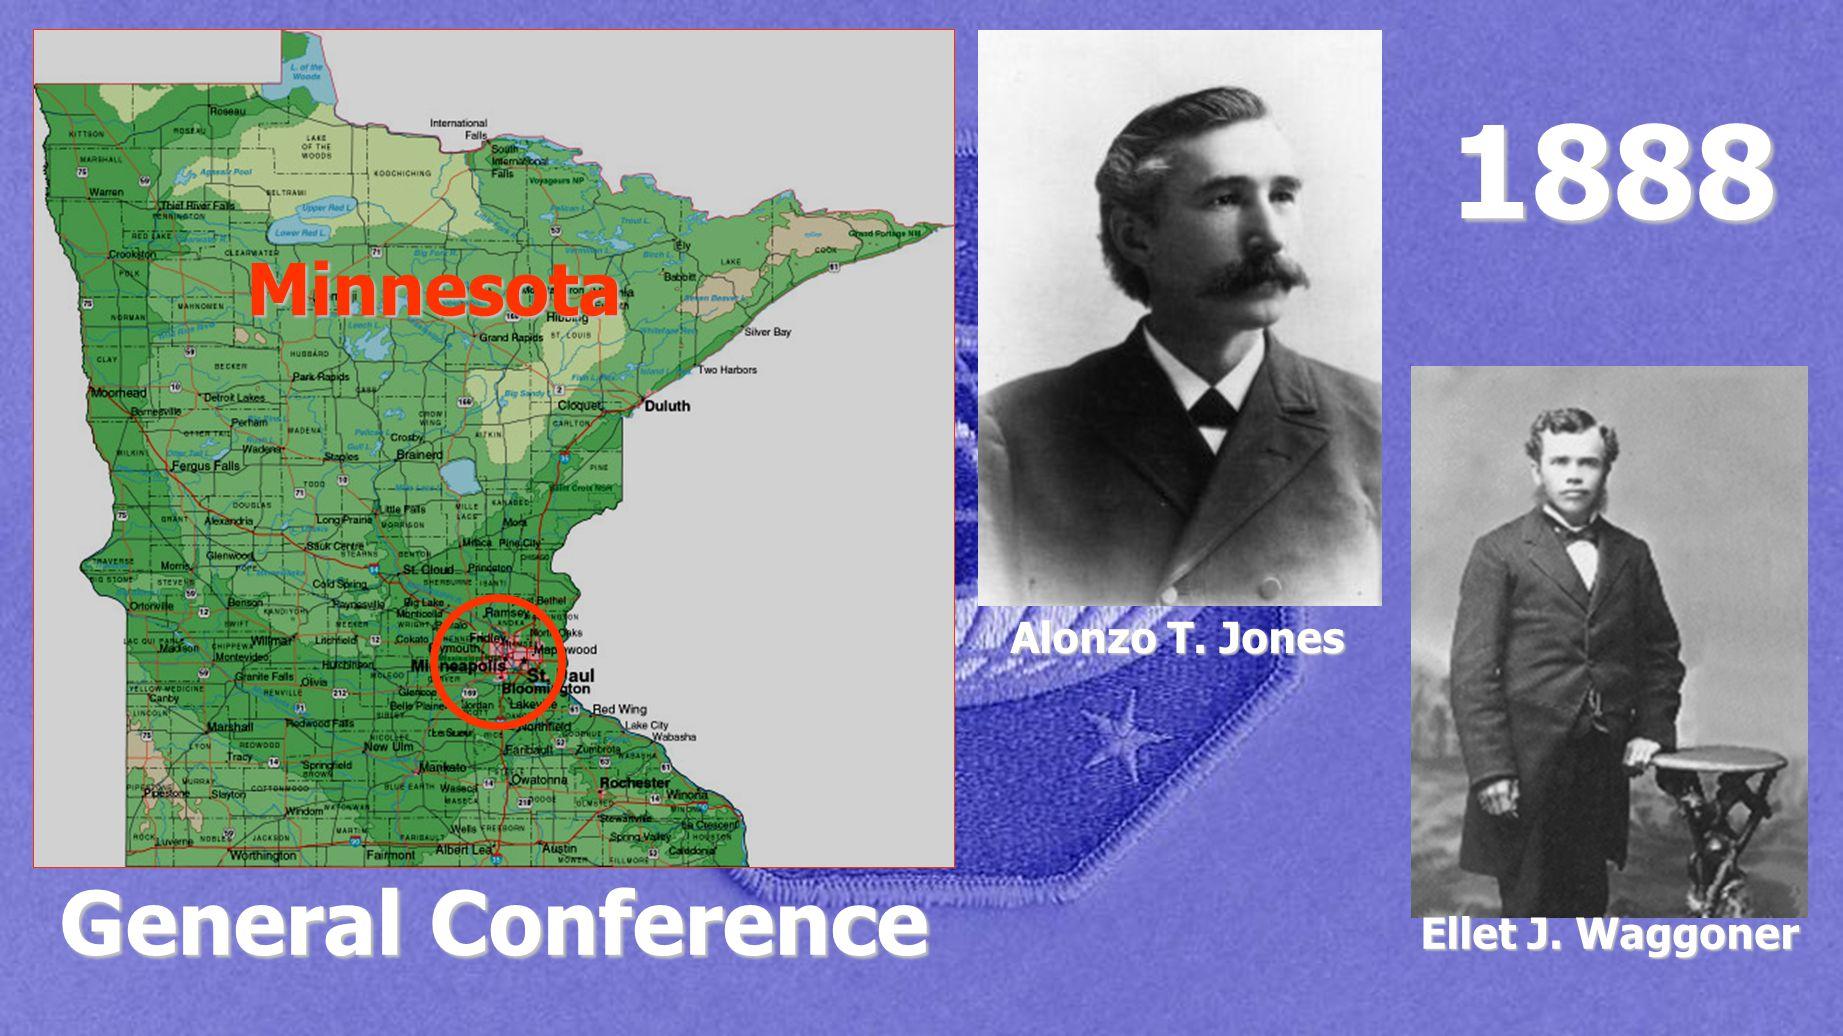 General Conference 1888 Alonzo T. Jones Ellet J. Waggoner Minnesota